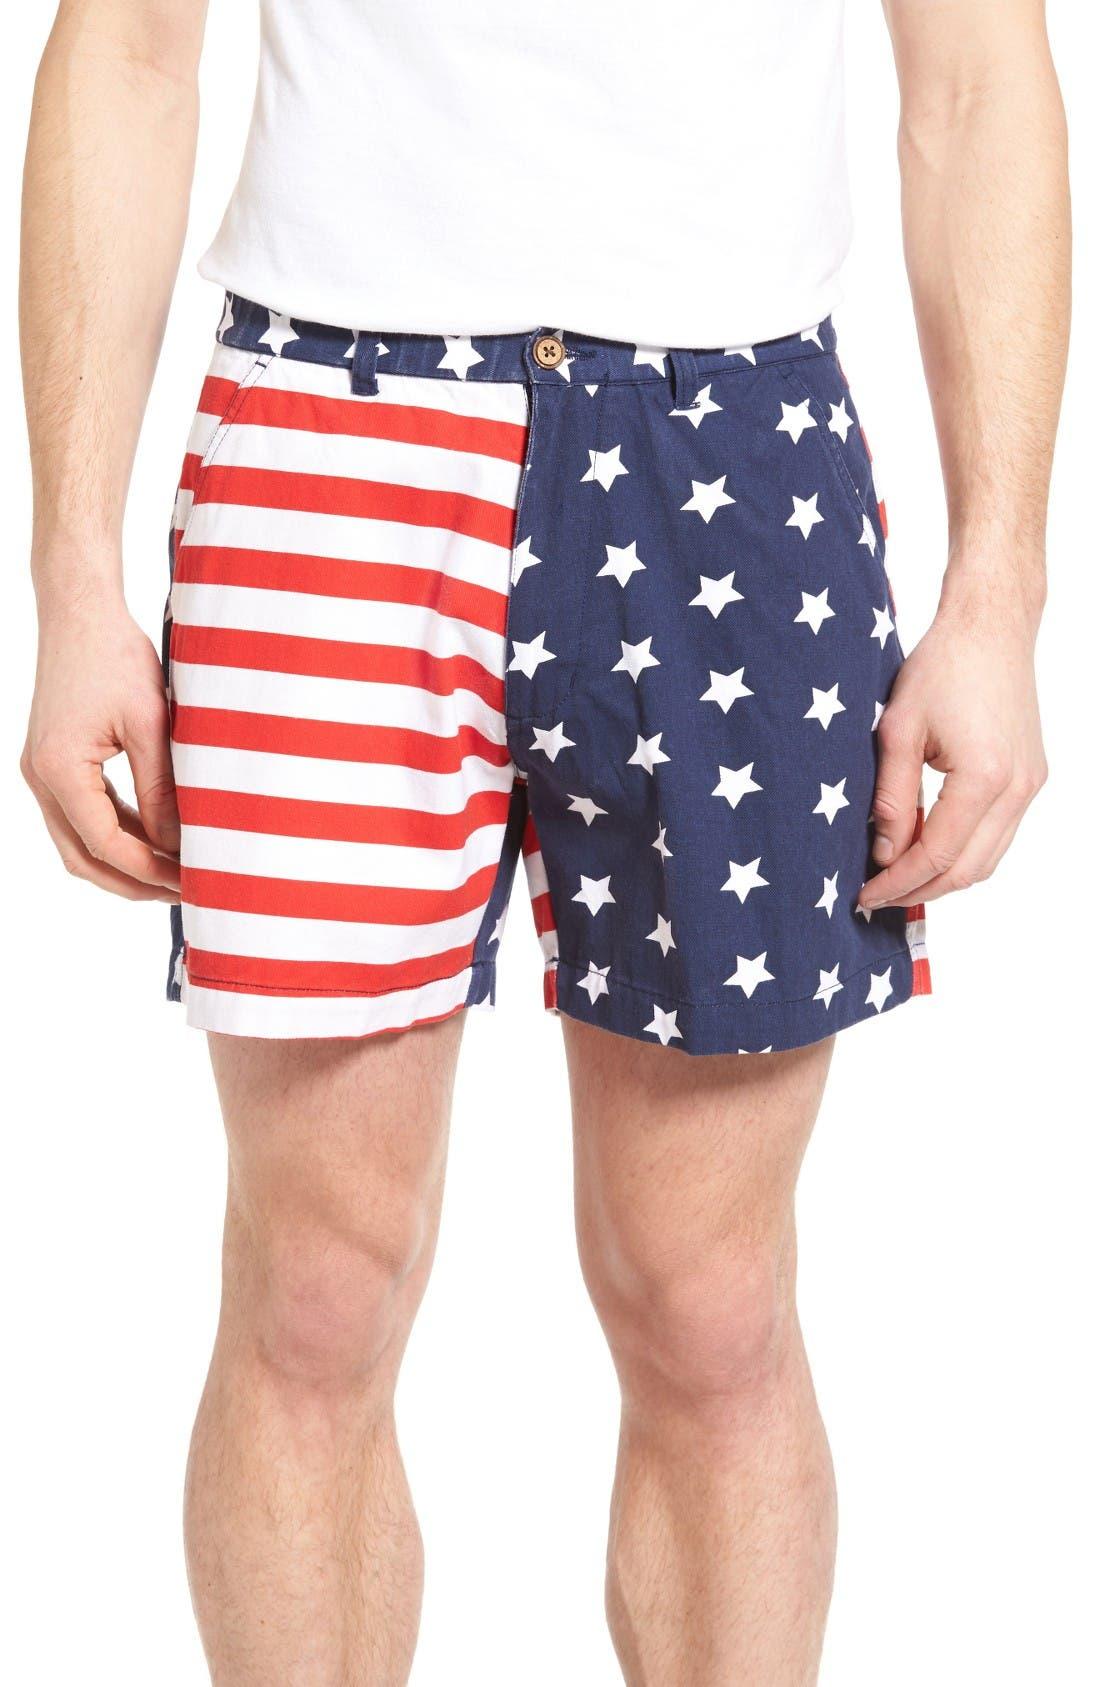 Snappers Americana Shorts,                         Main,                         color, Americana